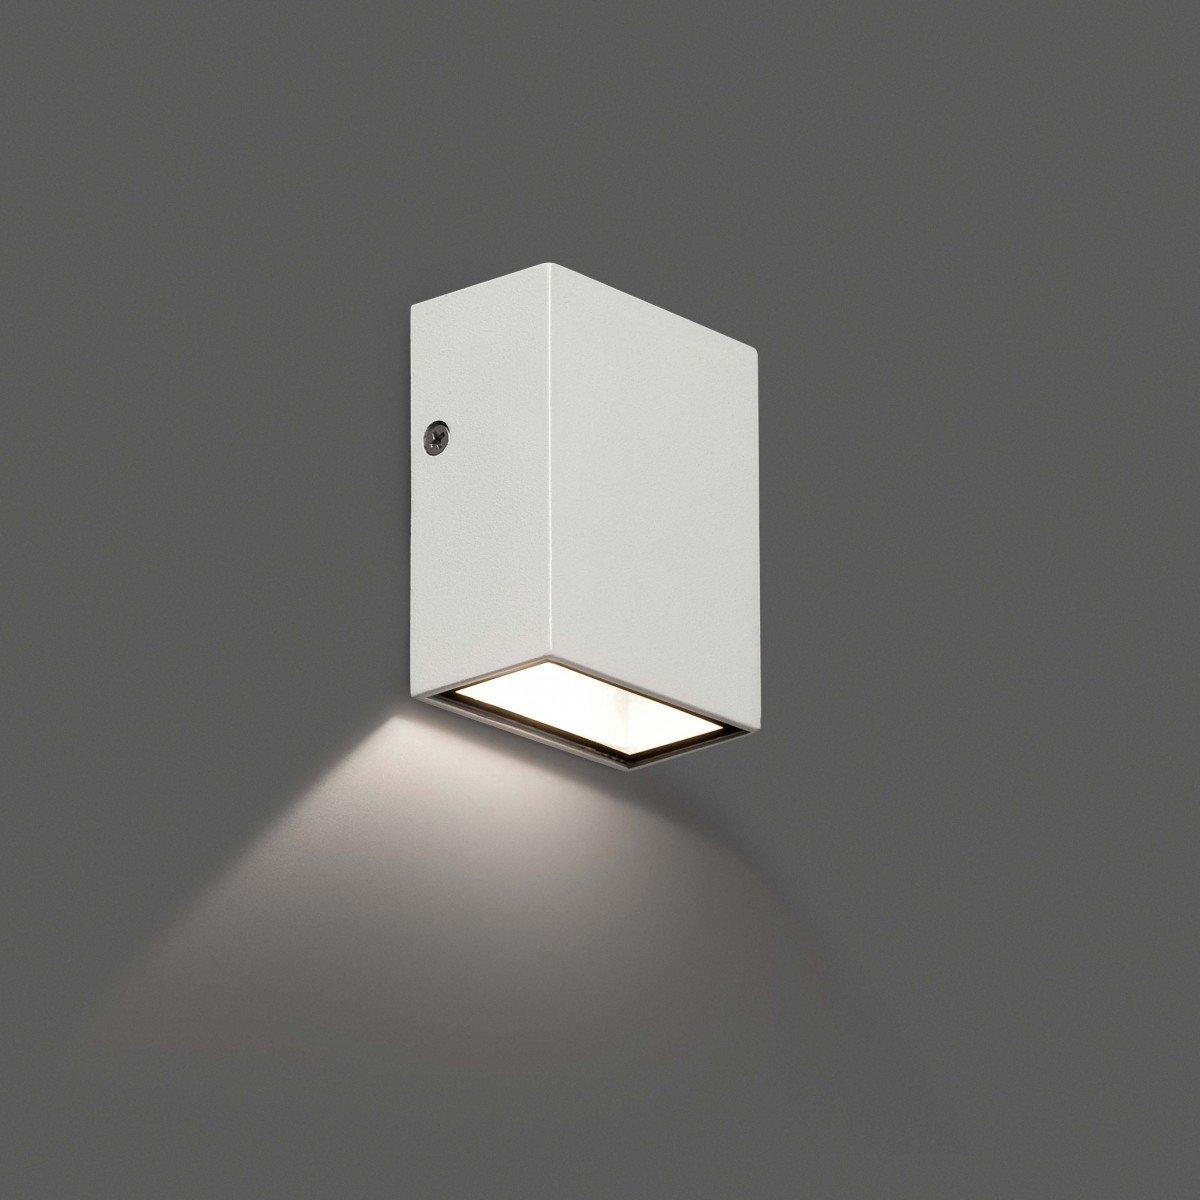 FARO CANON2 LED Lmpara aplique blanco 70567N ILUMINACIN EXTERIOR Apliques de pared Faro